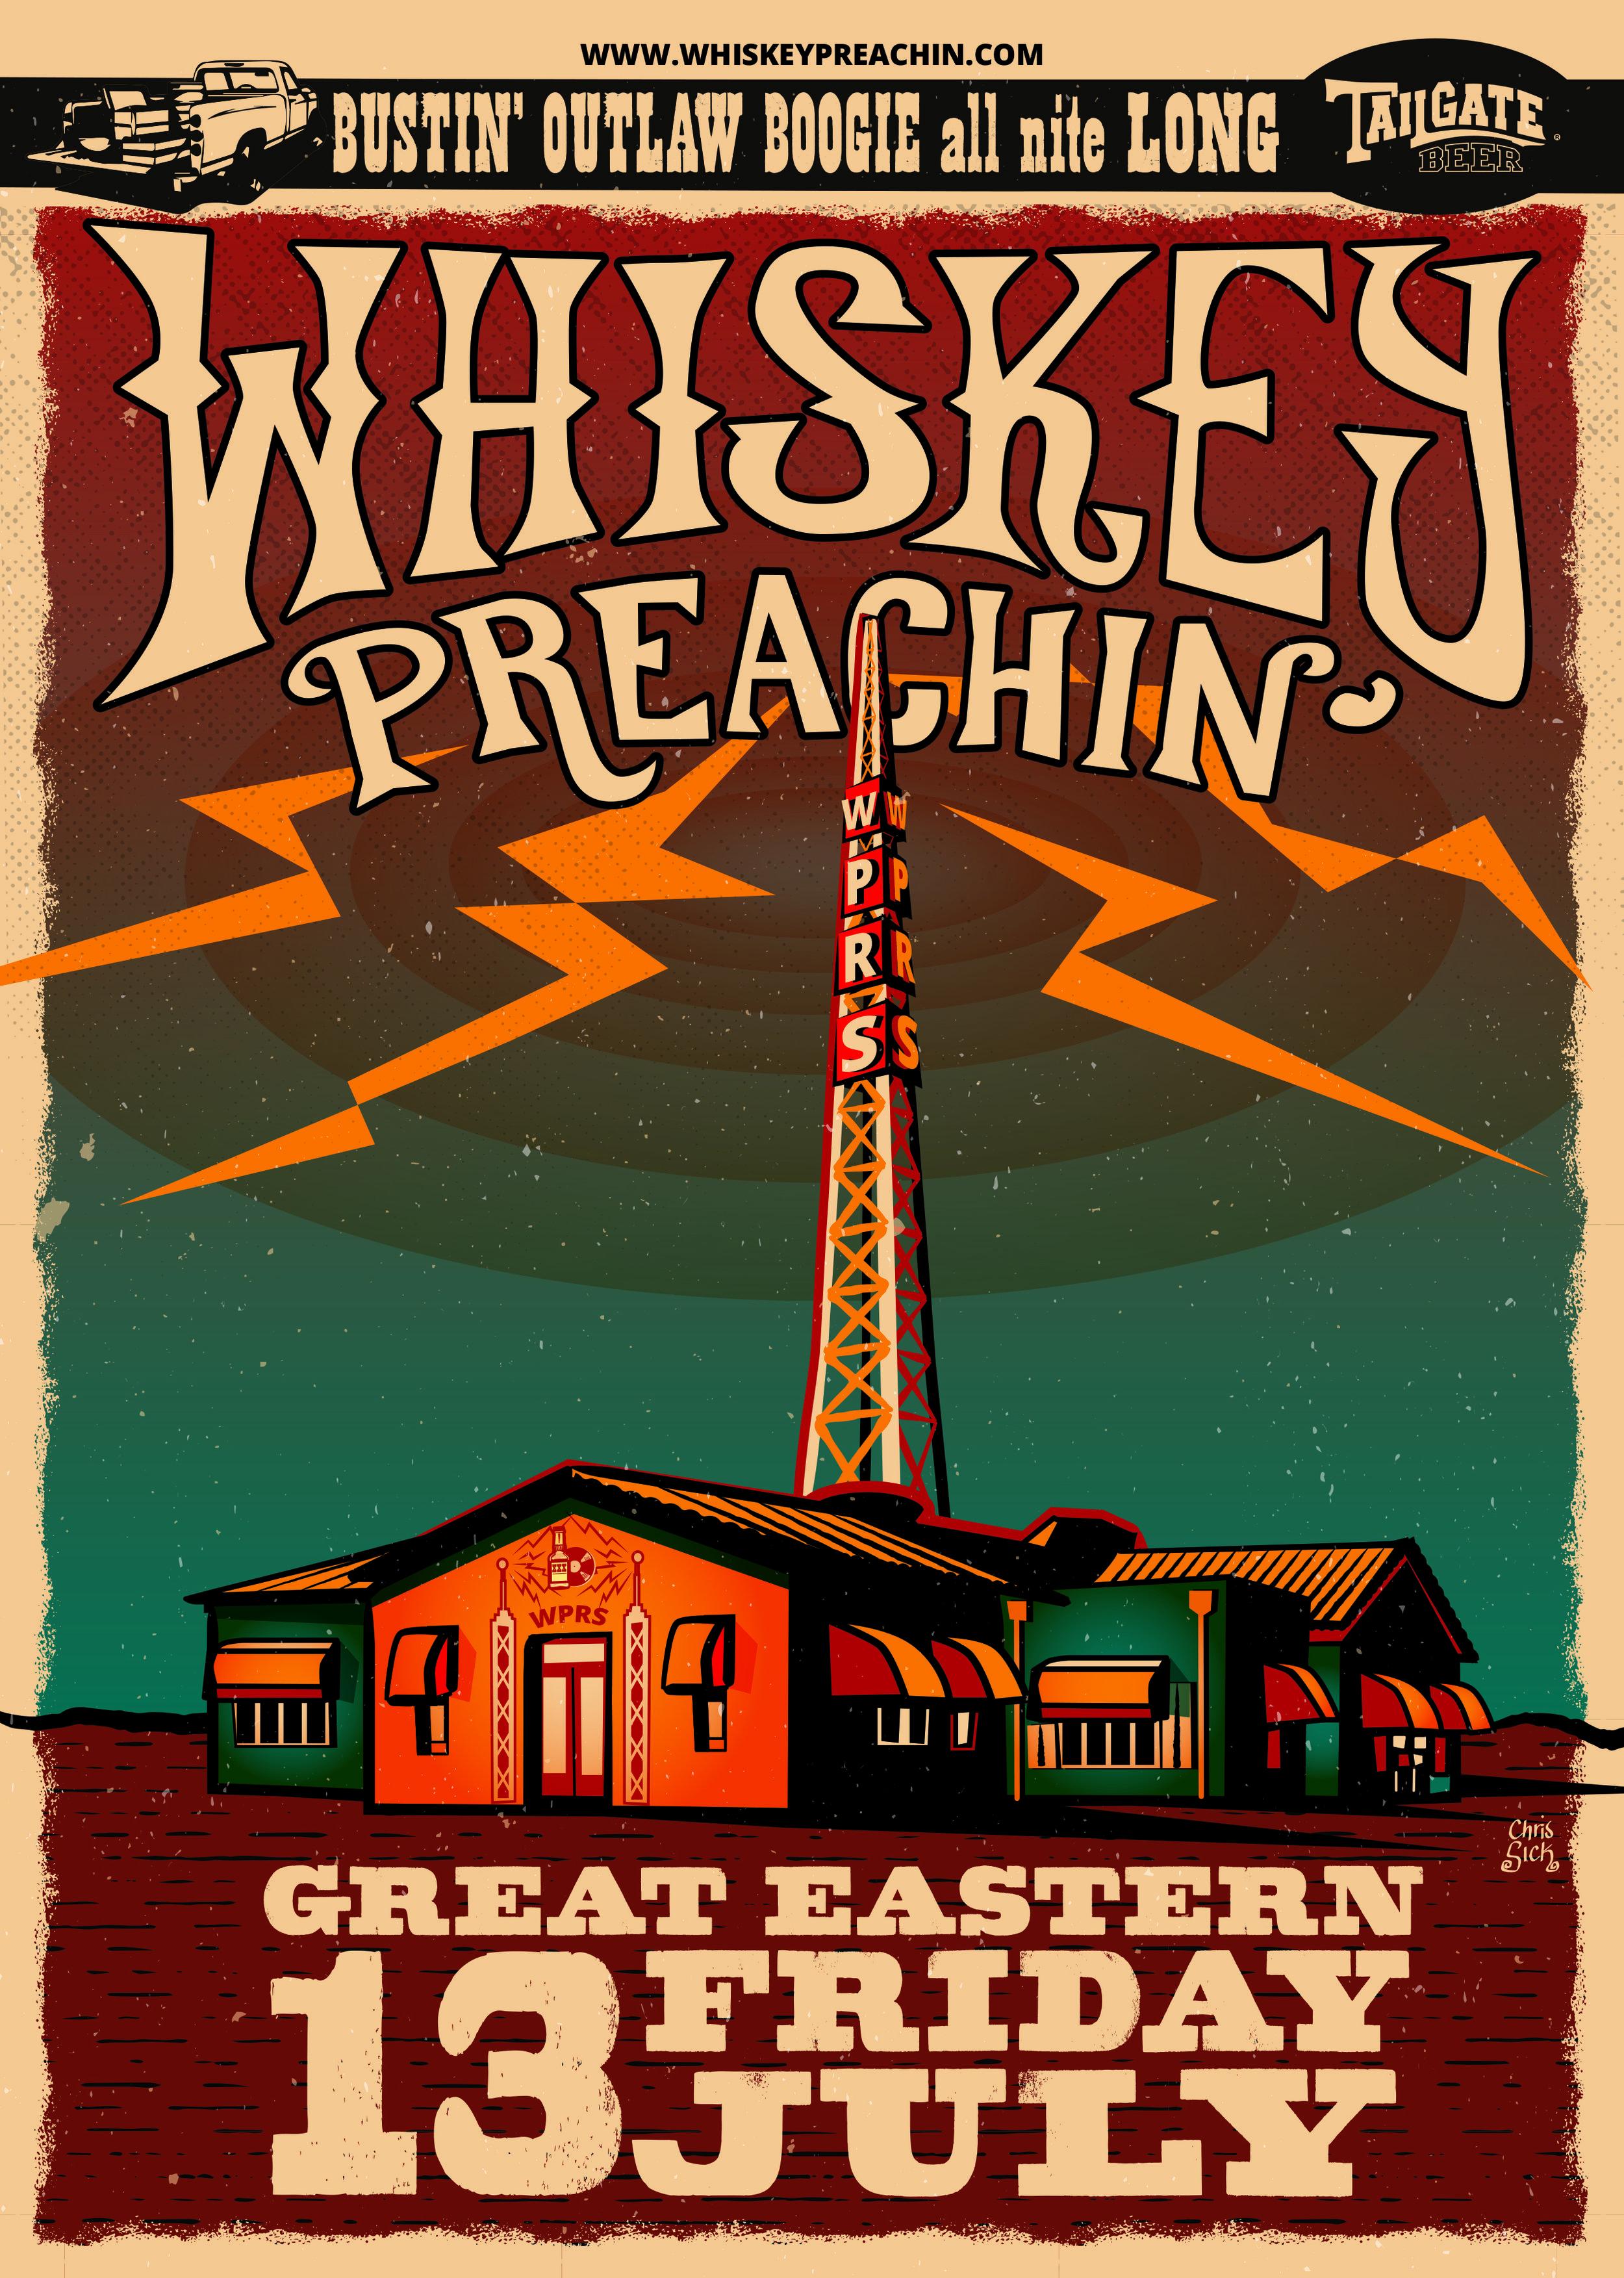 whiskey-preachin-poster-July-18.jpg